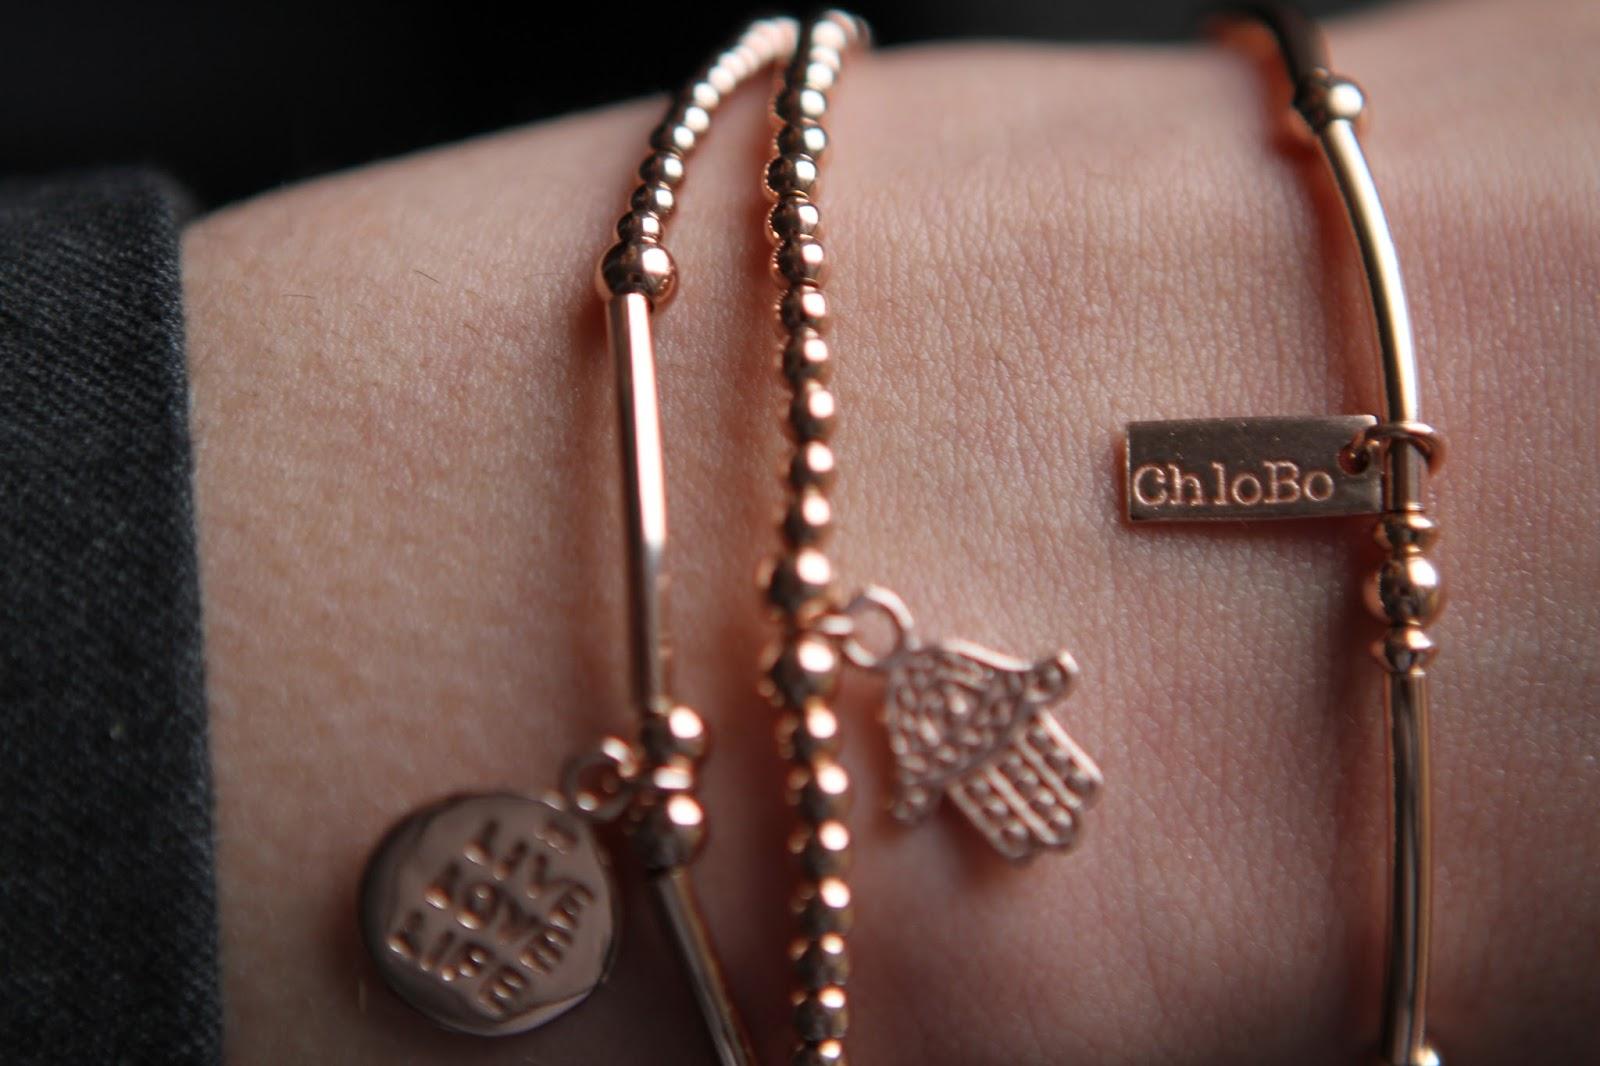 Chlobo rose gold bracelets